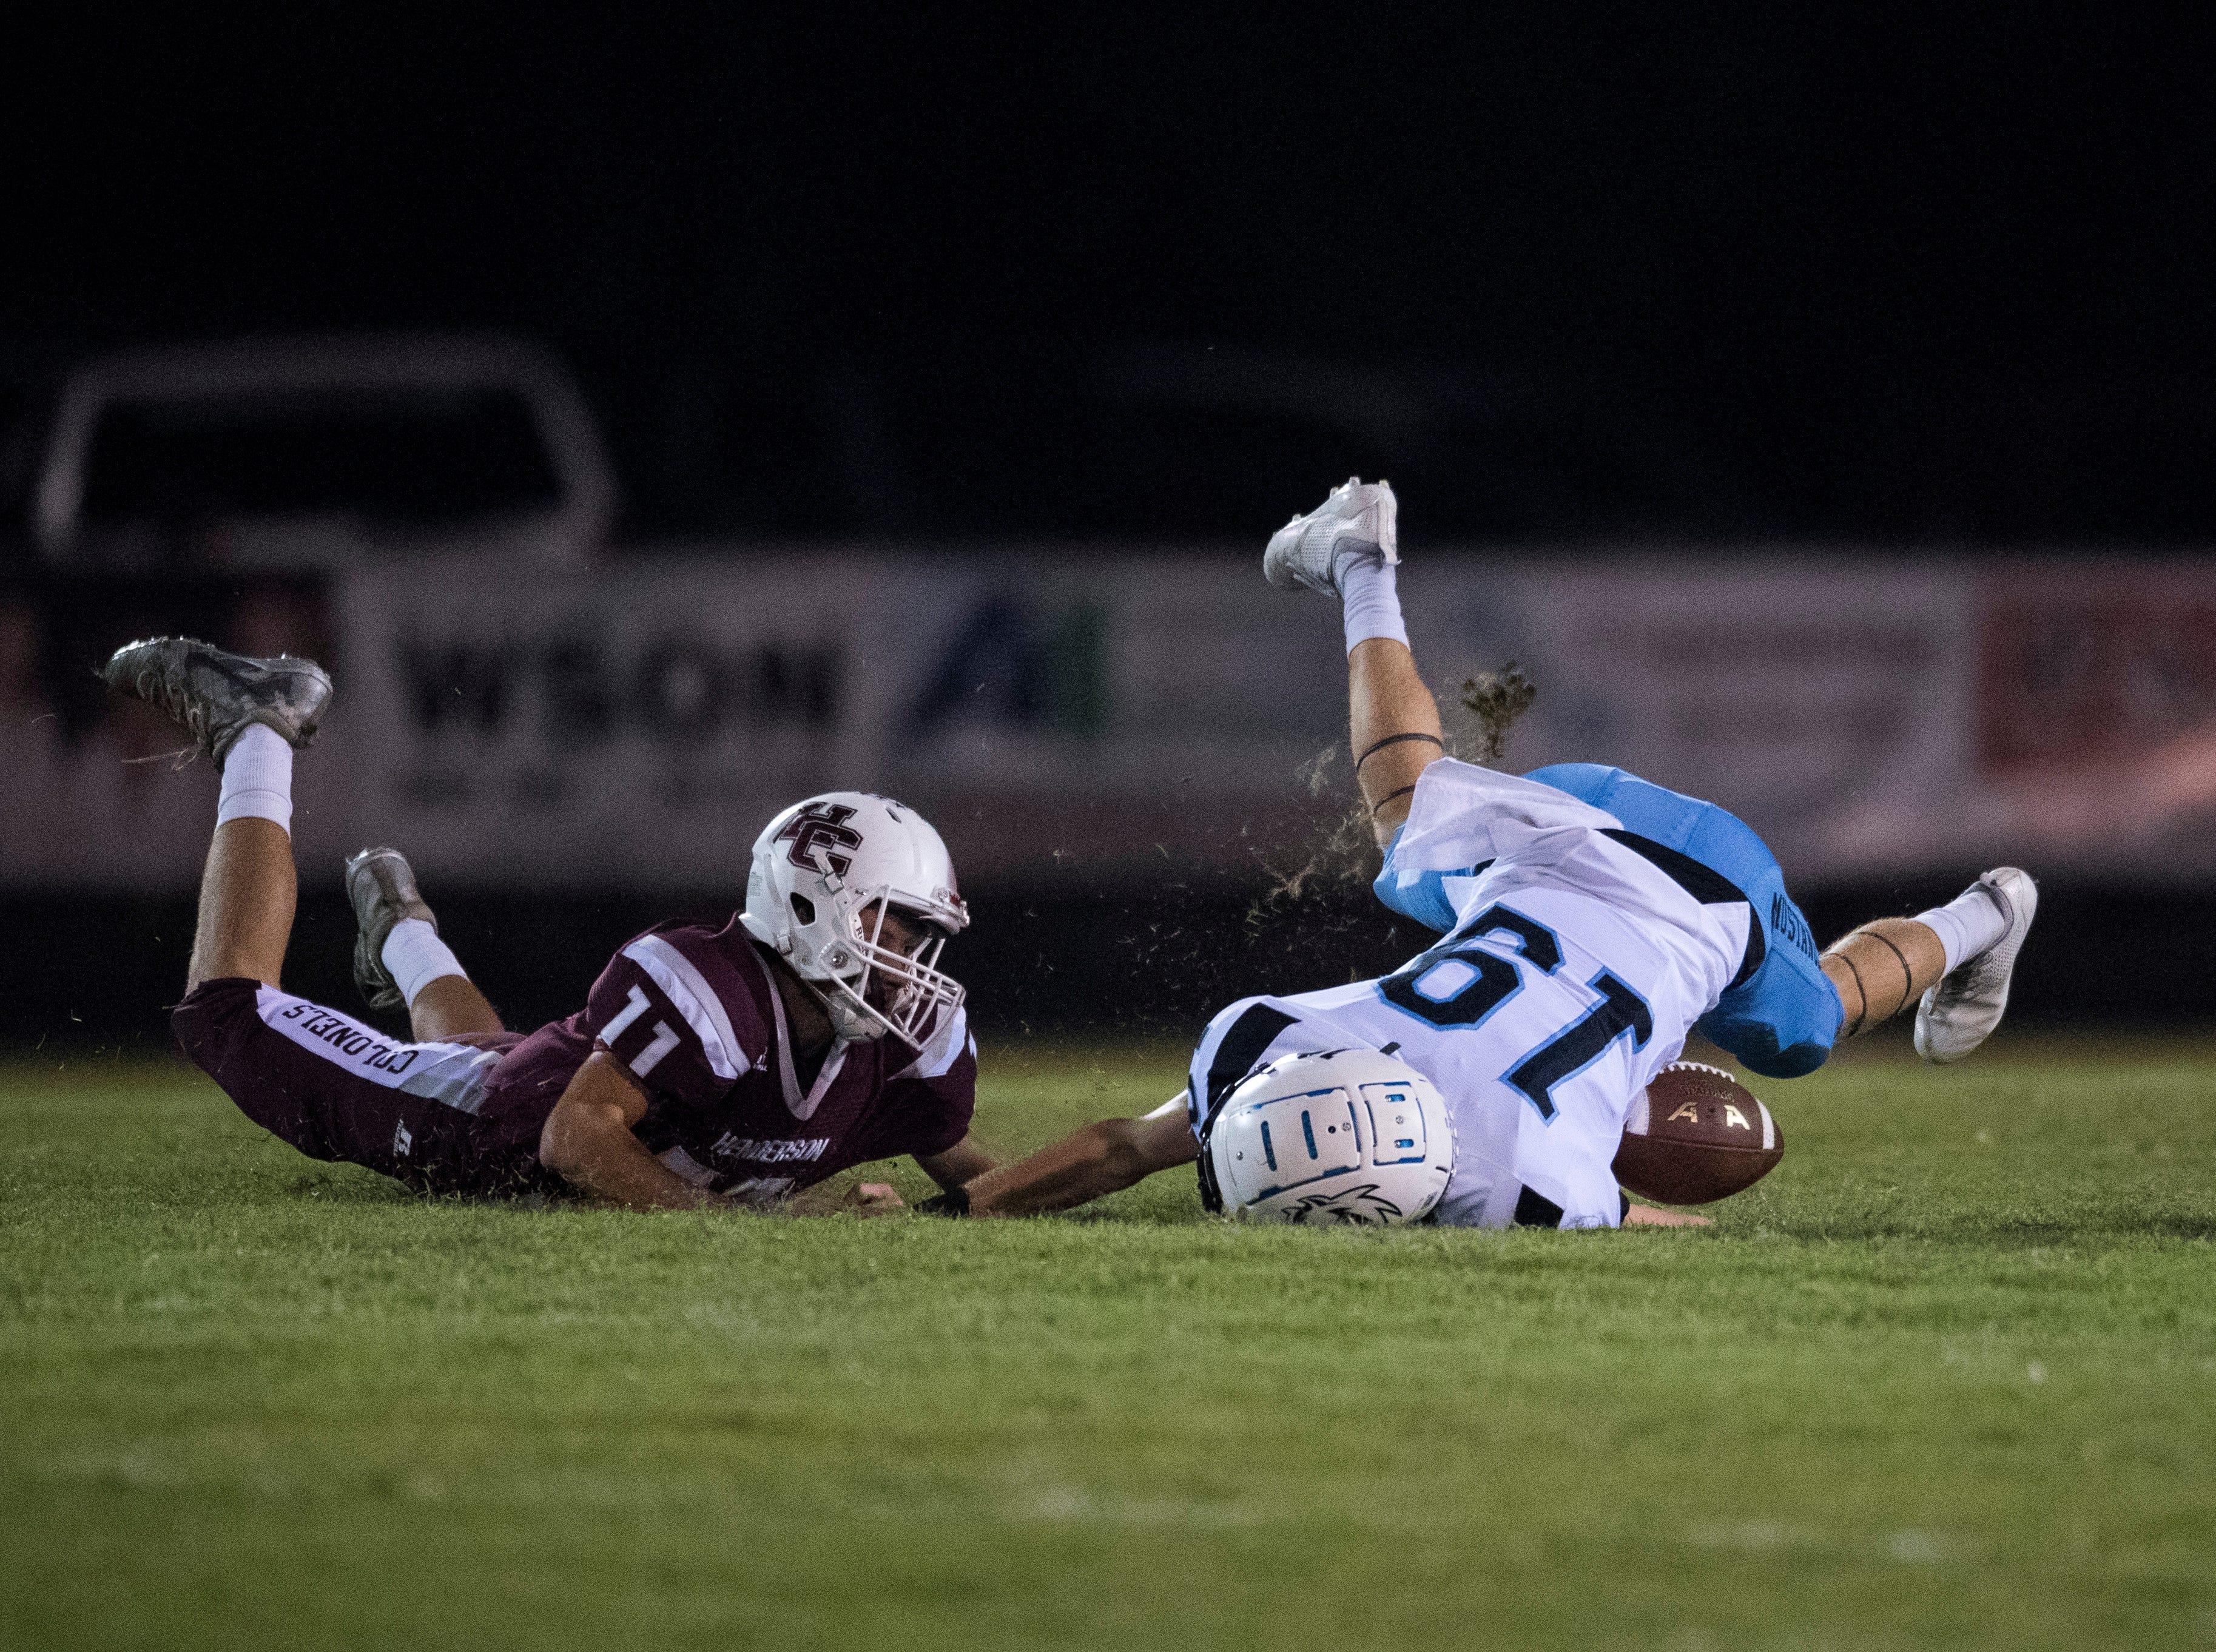 Henderson's Garrett Greenwell (11) tackles Muhlenberg County's Chris Chaney (19) during the Henderson vs Muhlenberg County game at Colonel Stadium Friday, Sept. 28, 2018. The Henderson County Colonels won, 61-6.